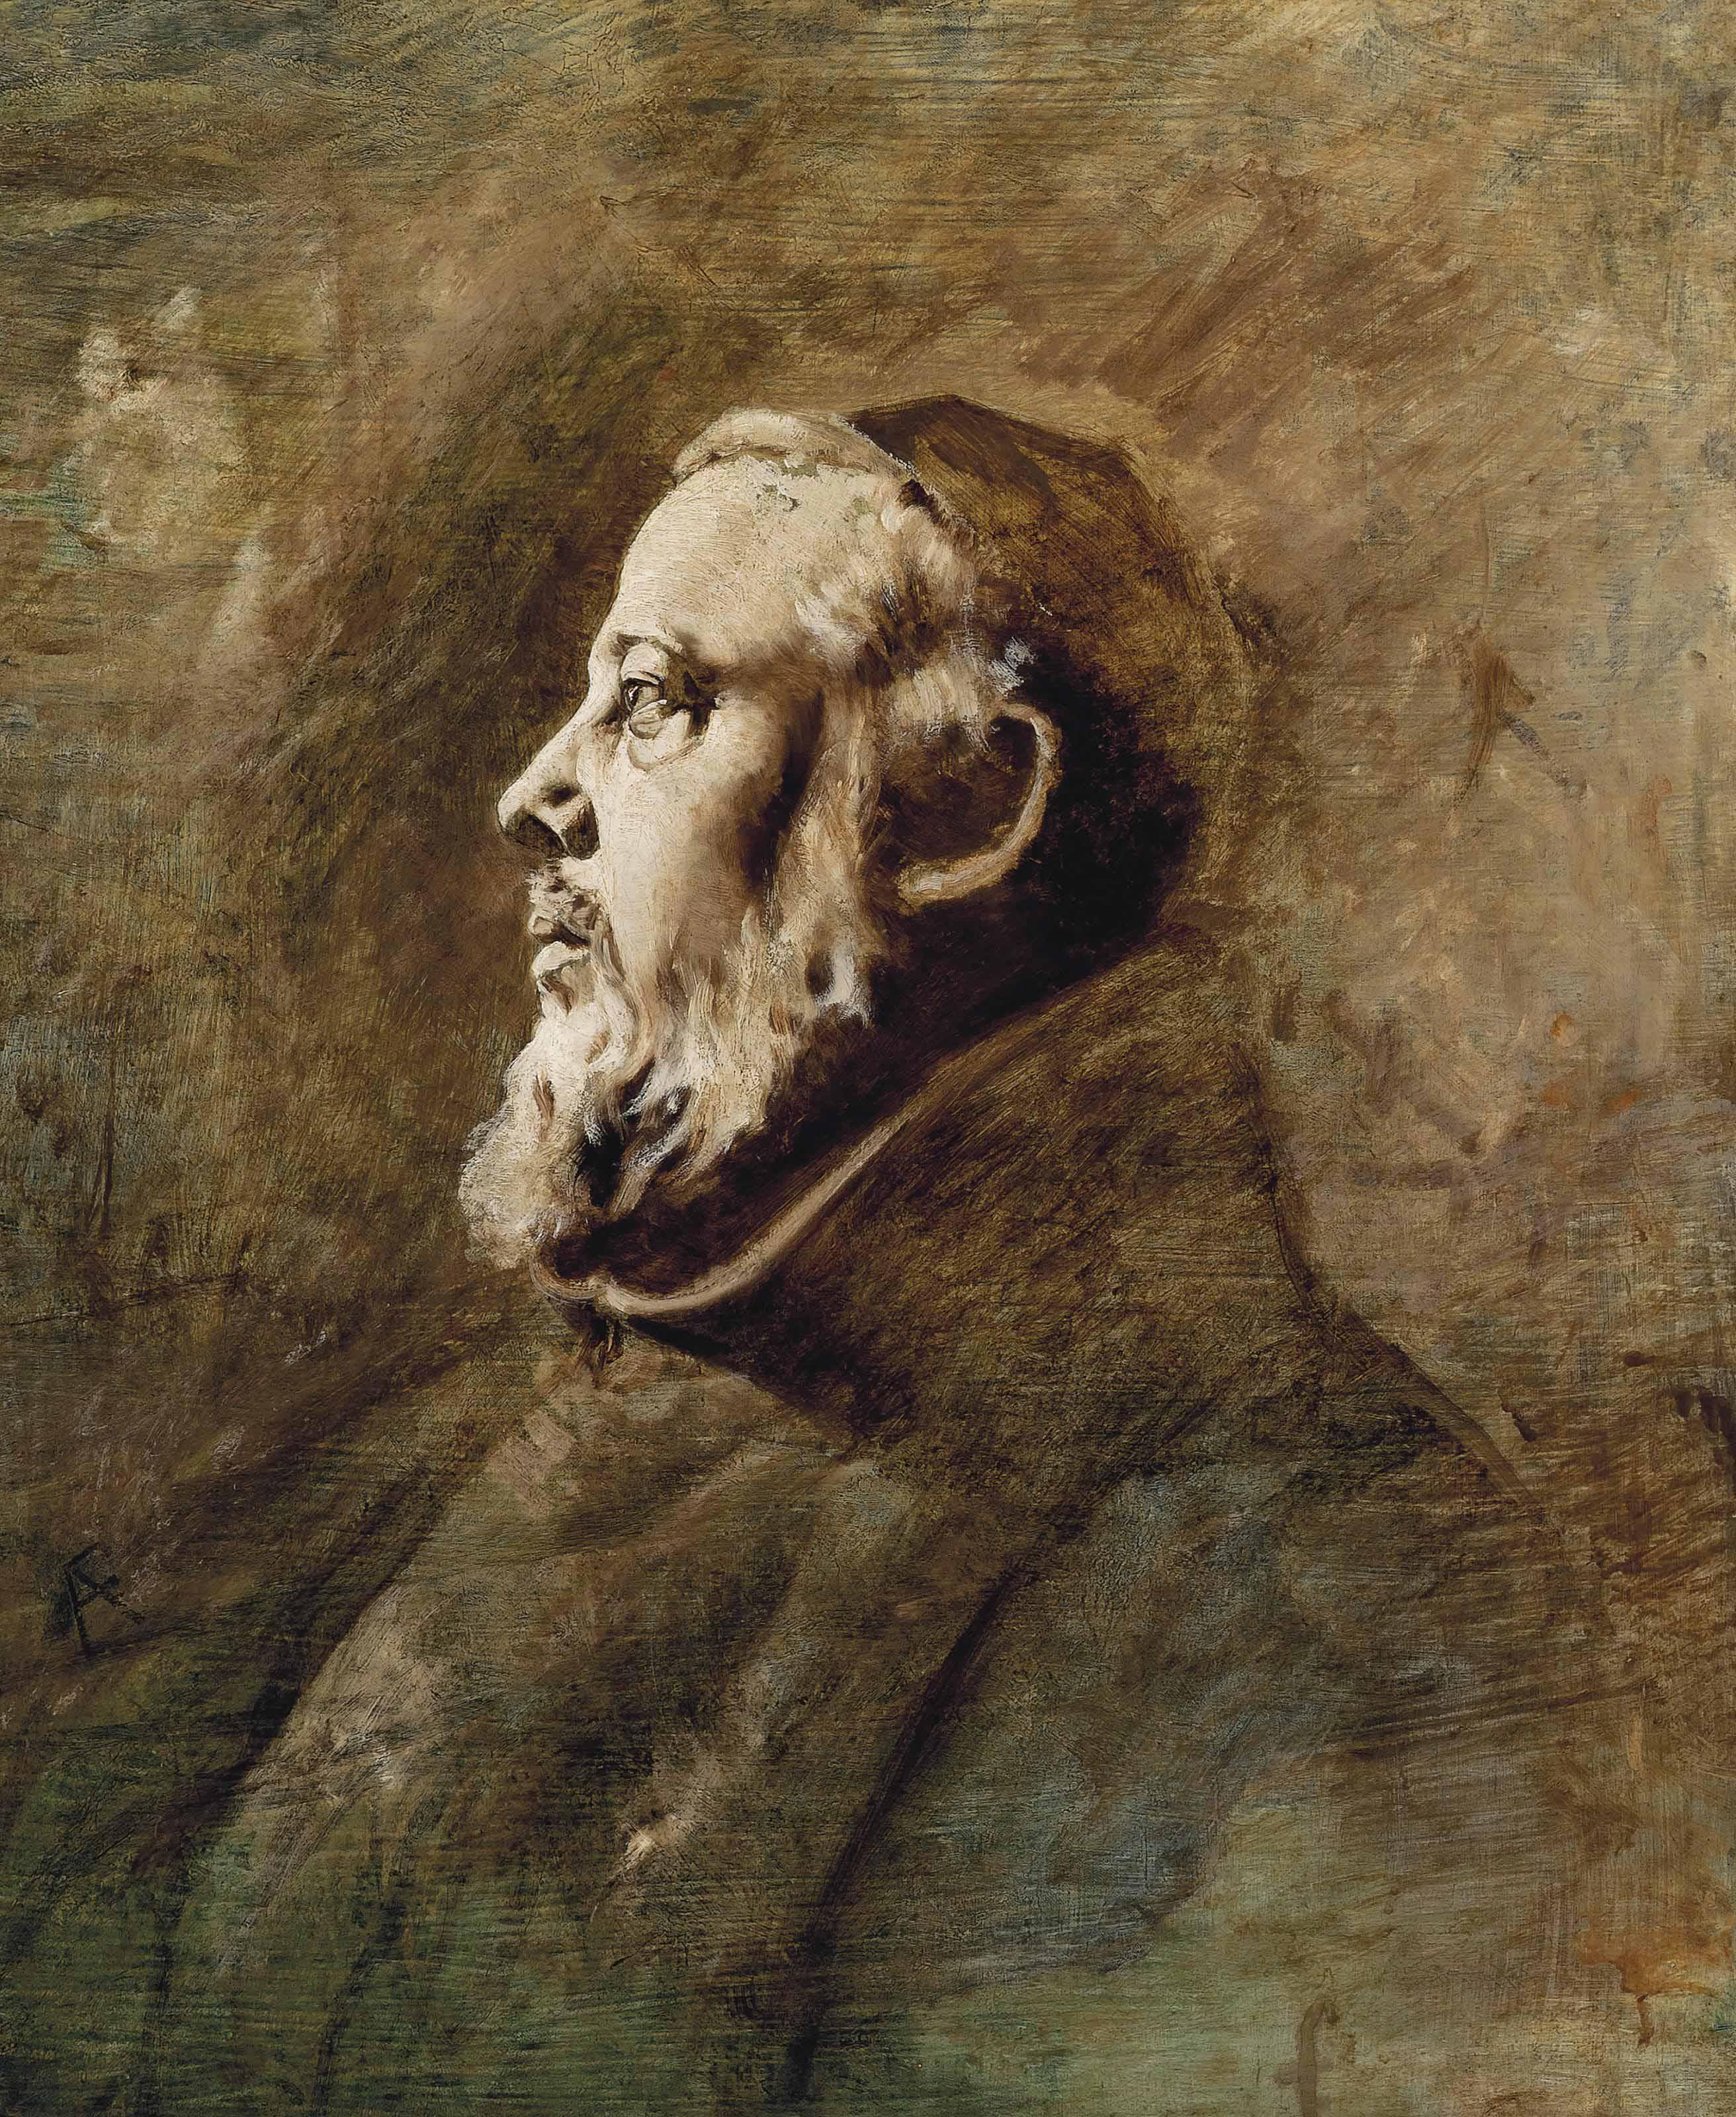 Bust portrait of a monk in profile